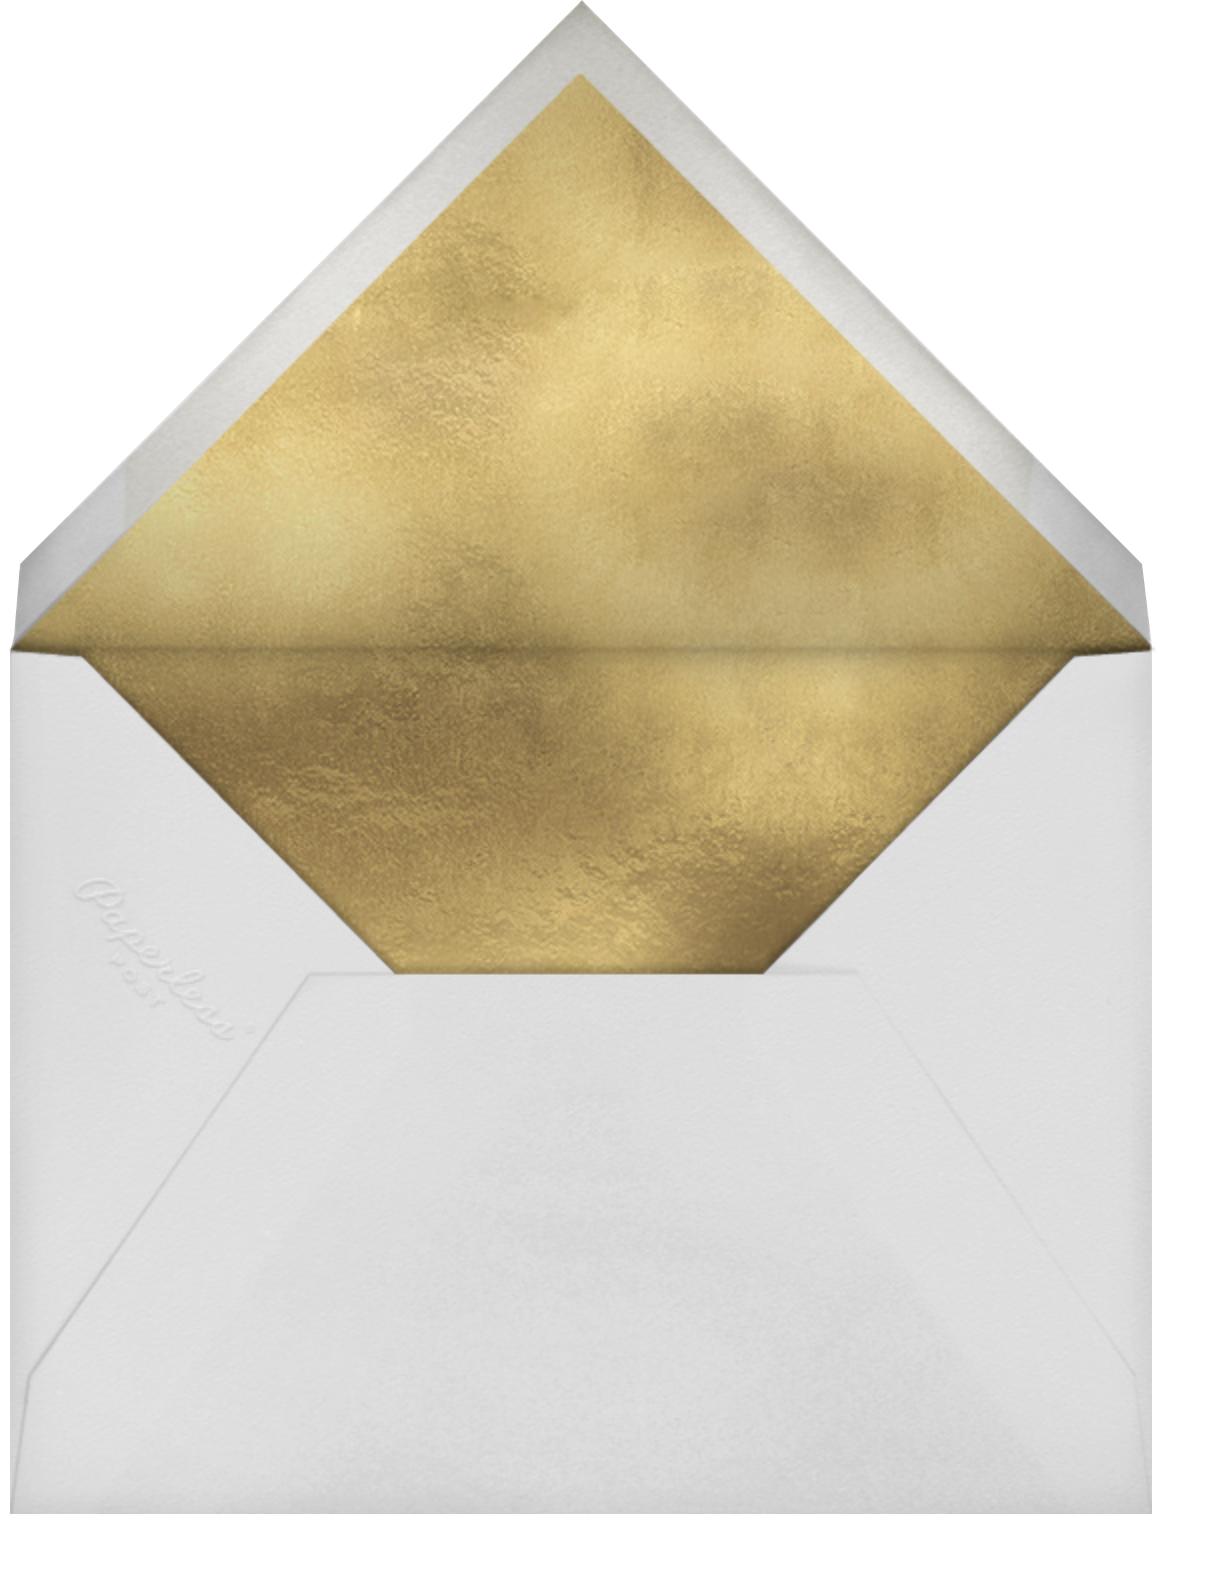 Pressed Poppies (Invitation) - Oscar de la Renta - All - envelope back